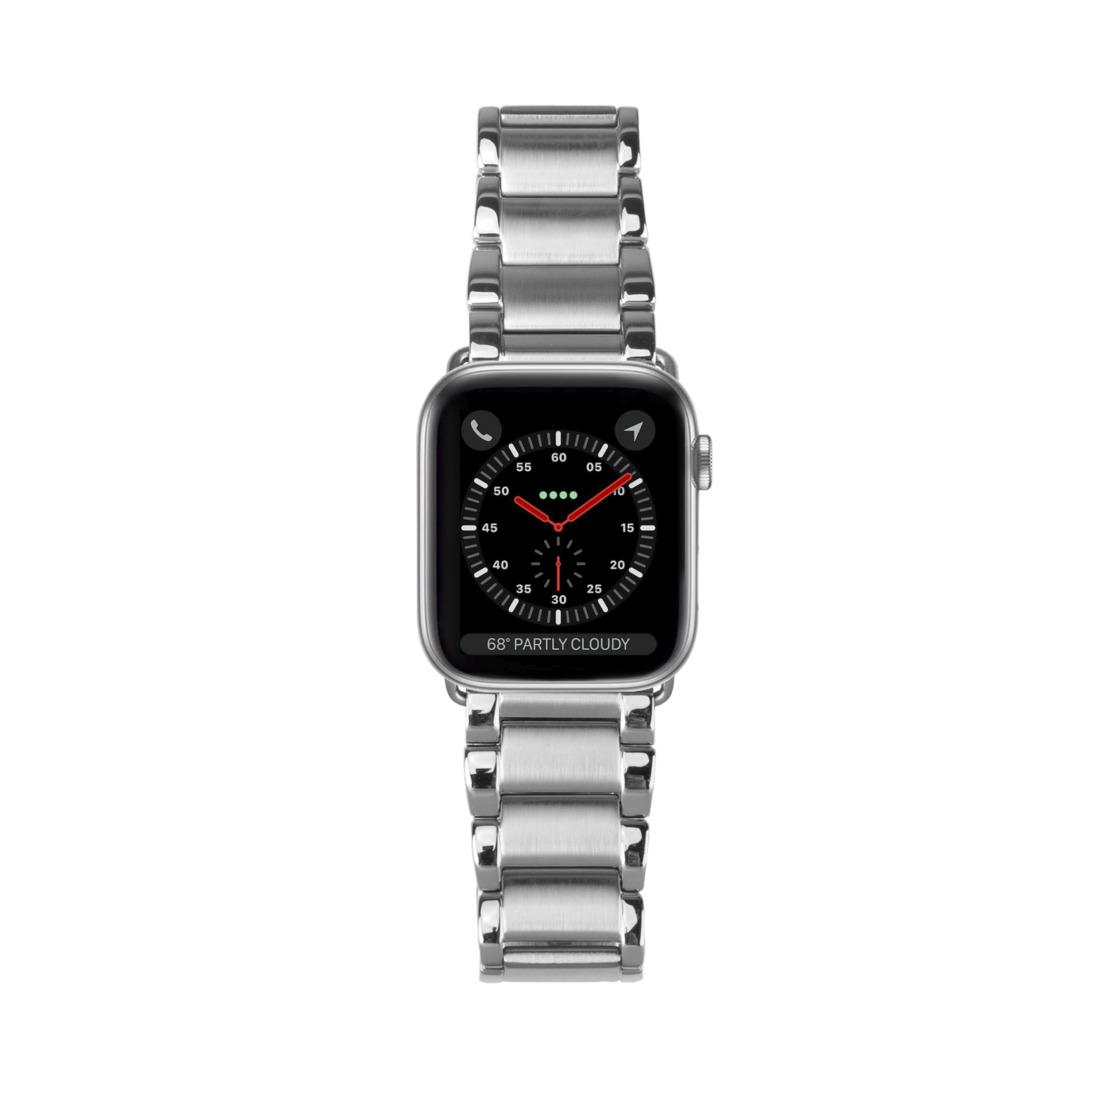 Apple Watch Band - Link Bracelet Band (38mm/40mm) - Silver